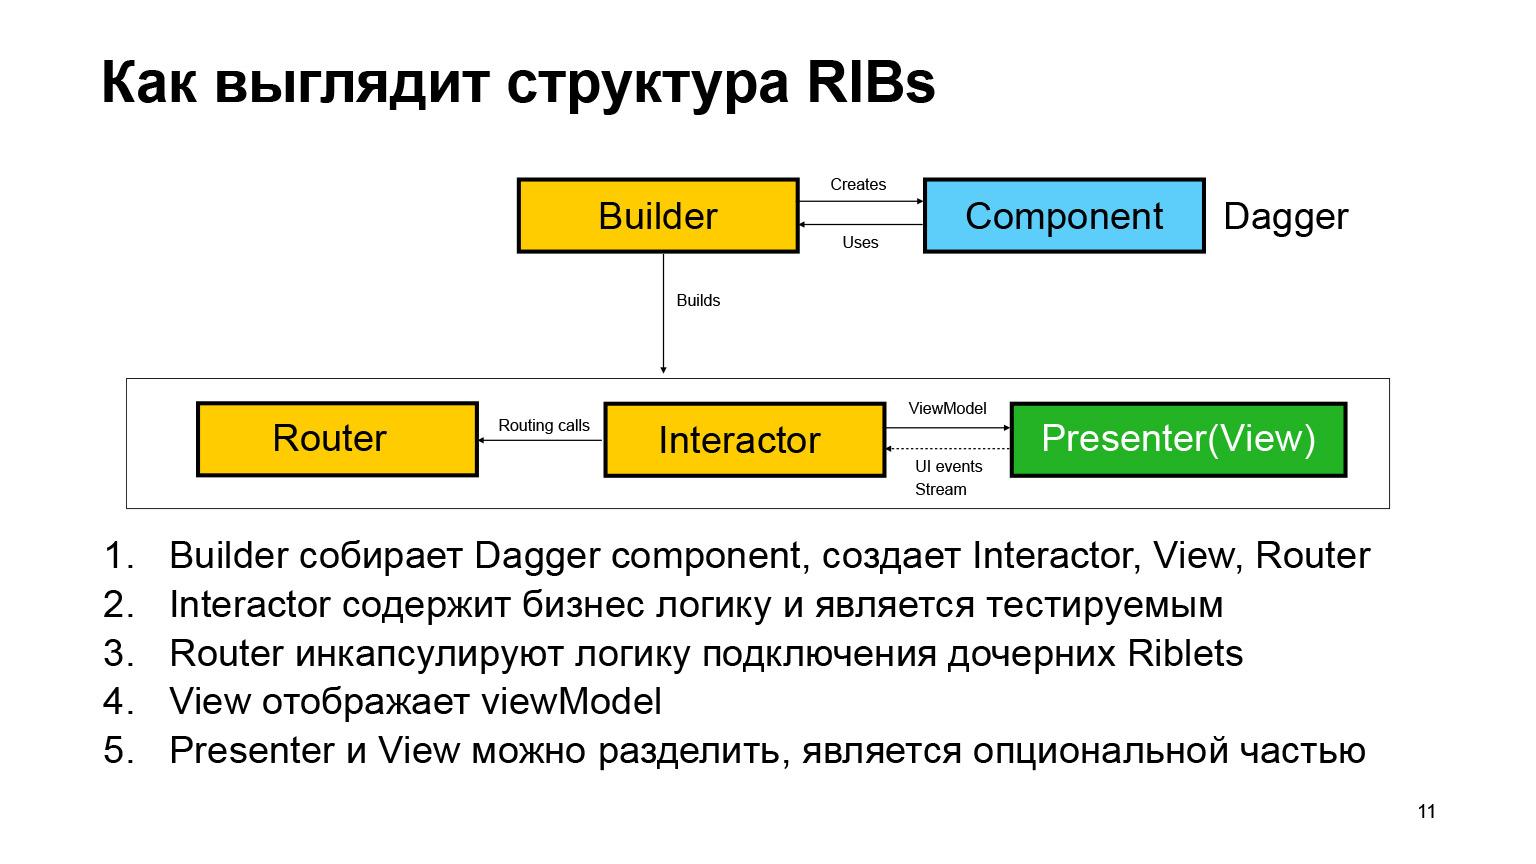 Как мы внедряли архитектуру RIBs. Доклад Яндекс.Такси - 7